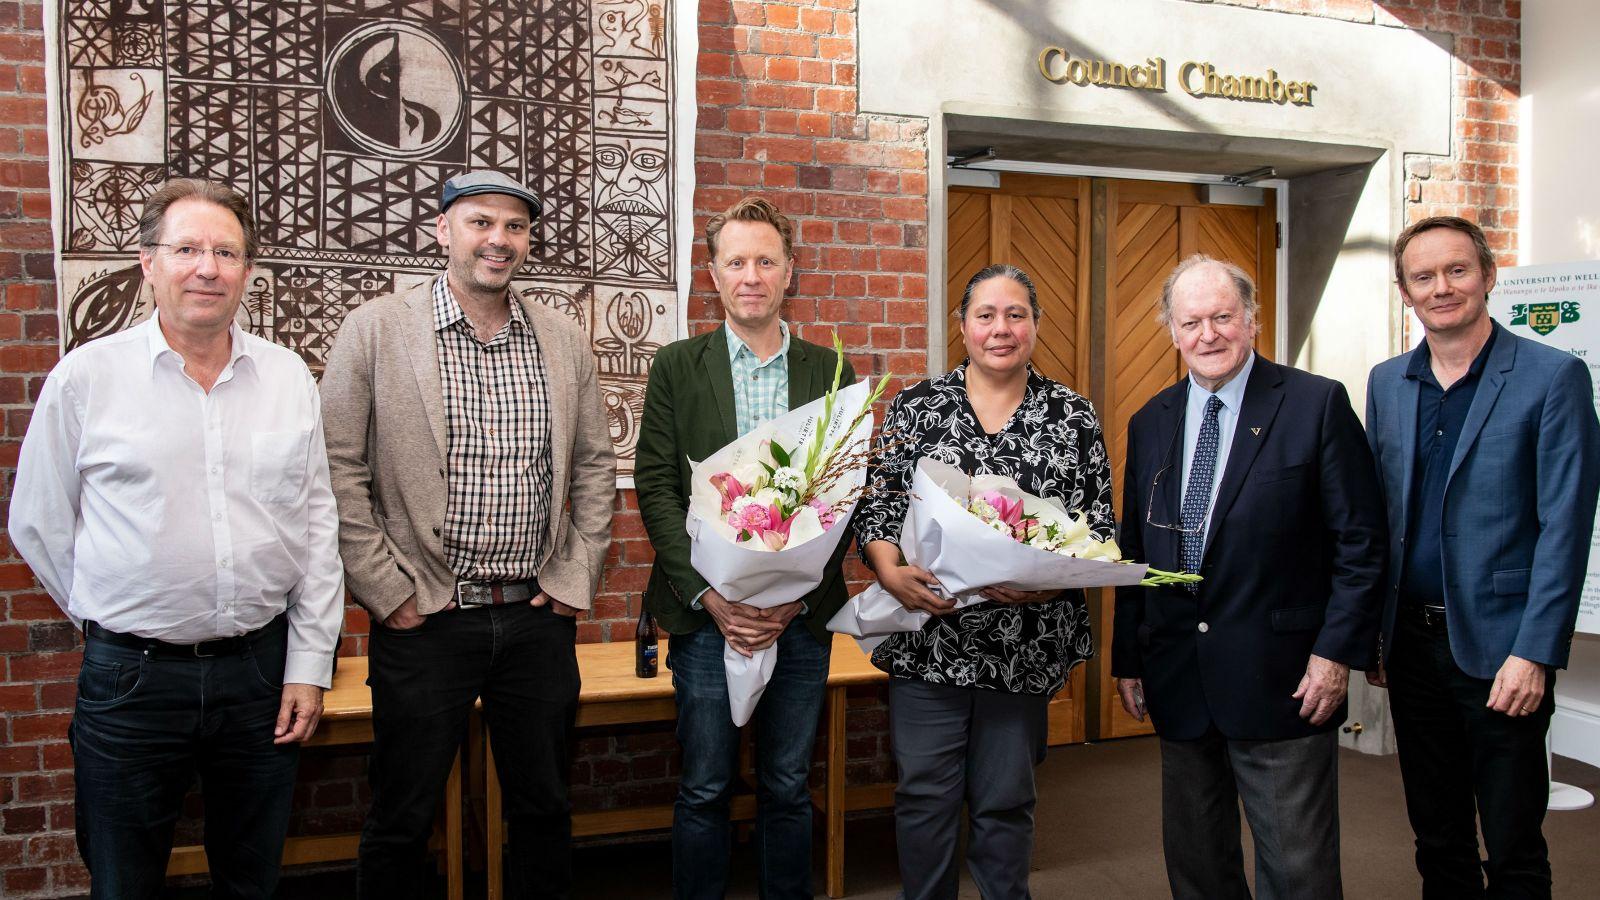 Winners of the David Carson-Parker Embassy Prize in Scriptwriting and the Brad McGann Filmwriting Award, 2019. (Photographer: Robert Cross.)